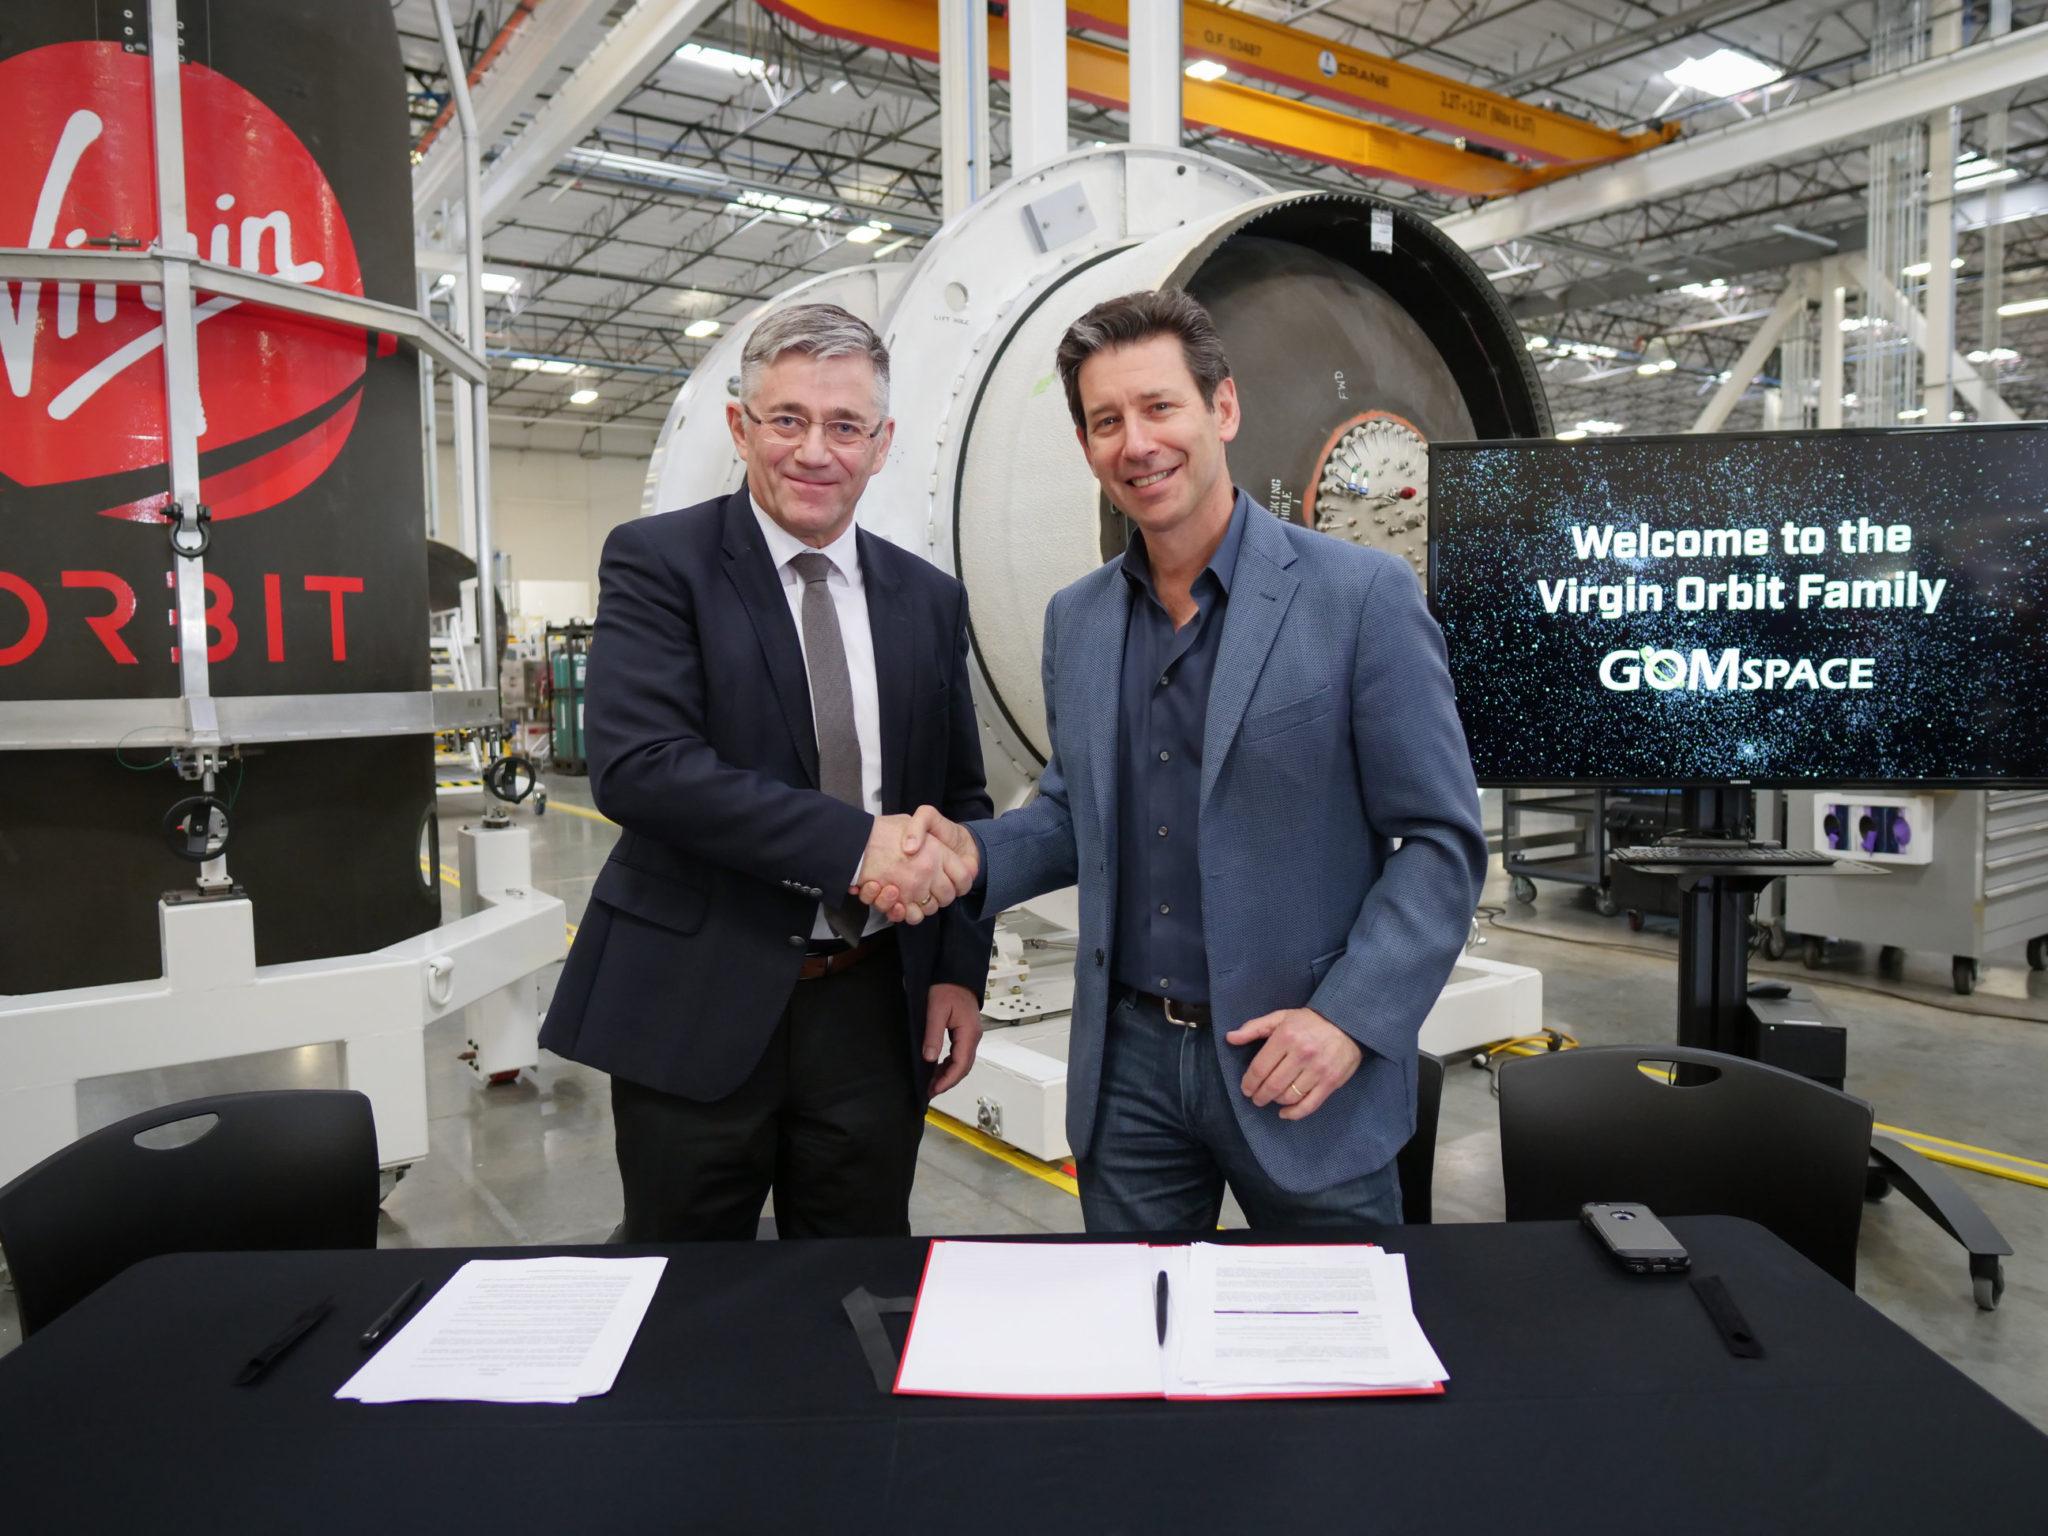 GomSpace Virgin Orbit LauncherOne